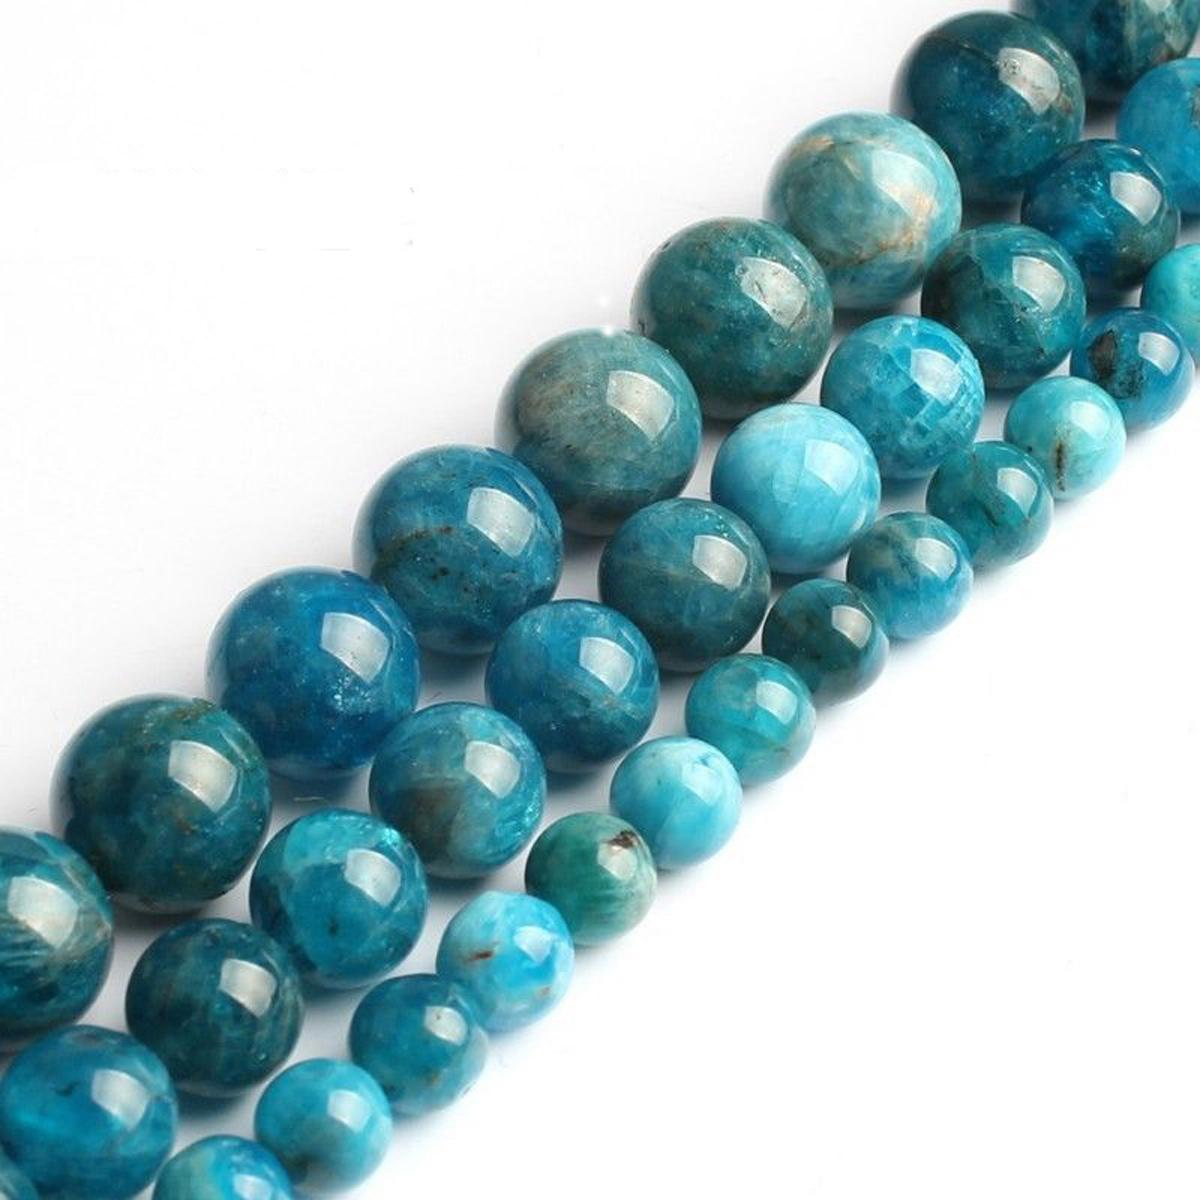 6-10mm Blue jade Gemstone Beautiful Round Loose Beads 15/'/'